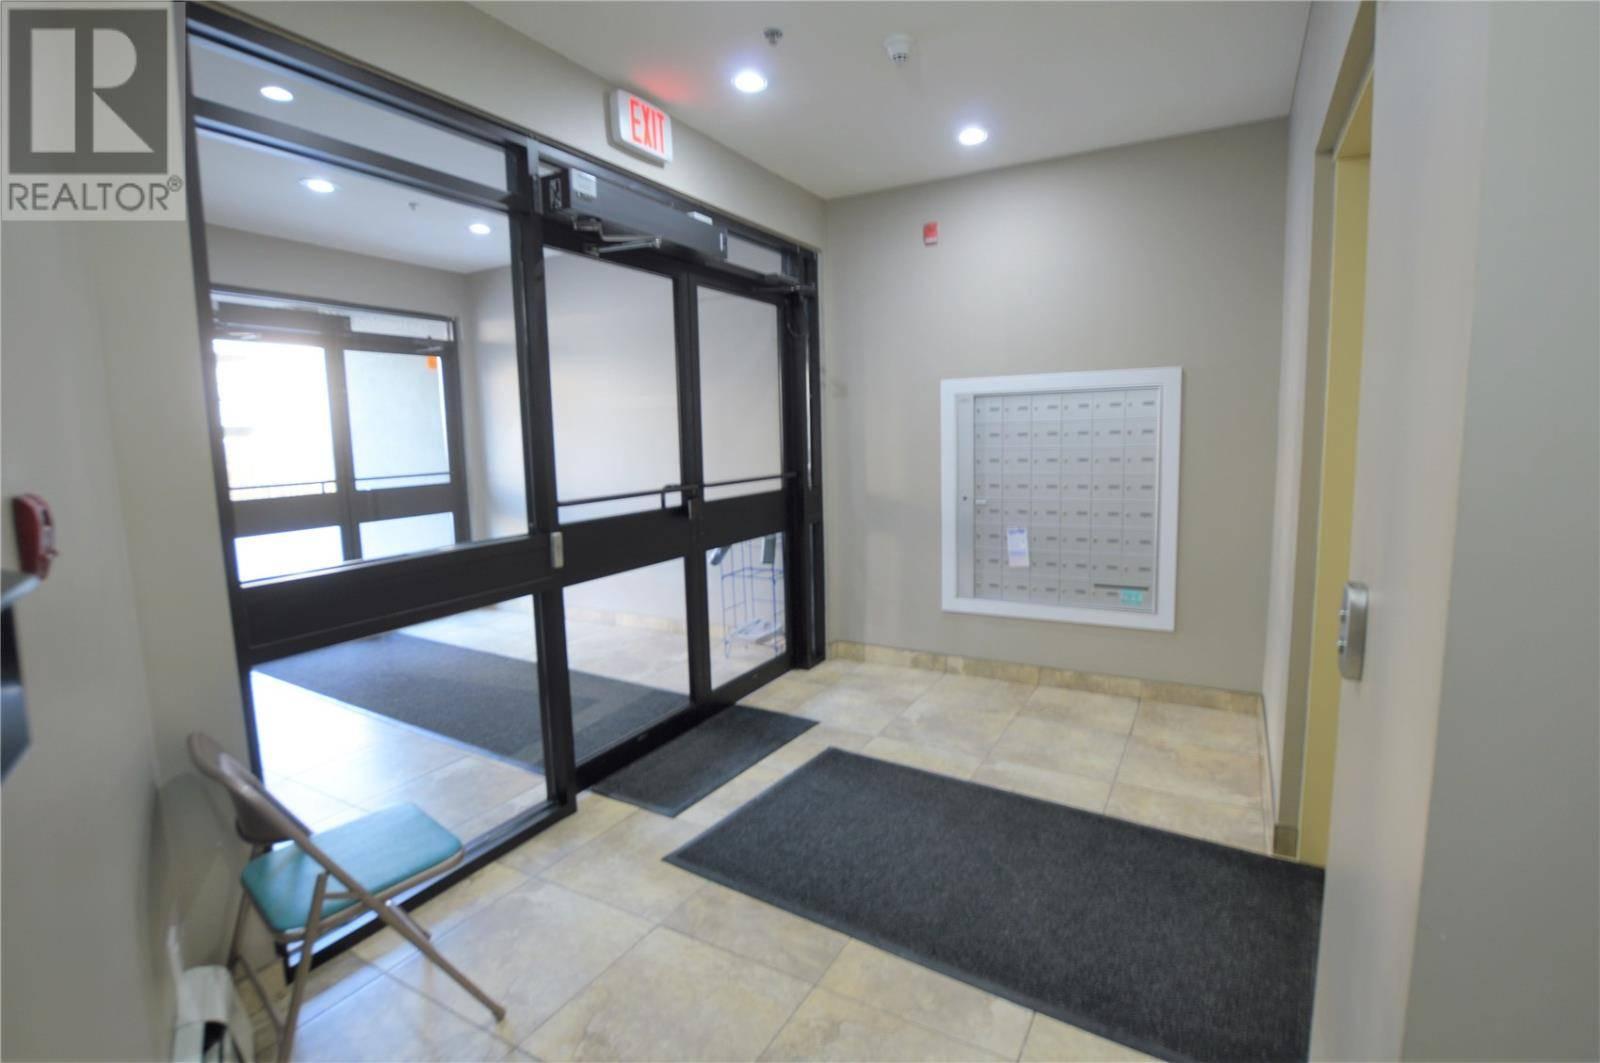 Condo for sale at 110 Hampton Circ Unit 313 Saskatoon Saskatchewan - MLS: SK775756